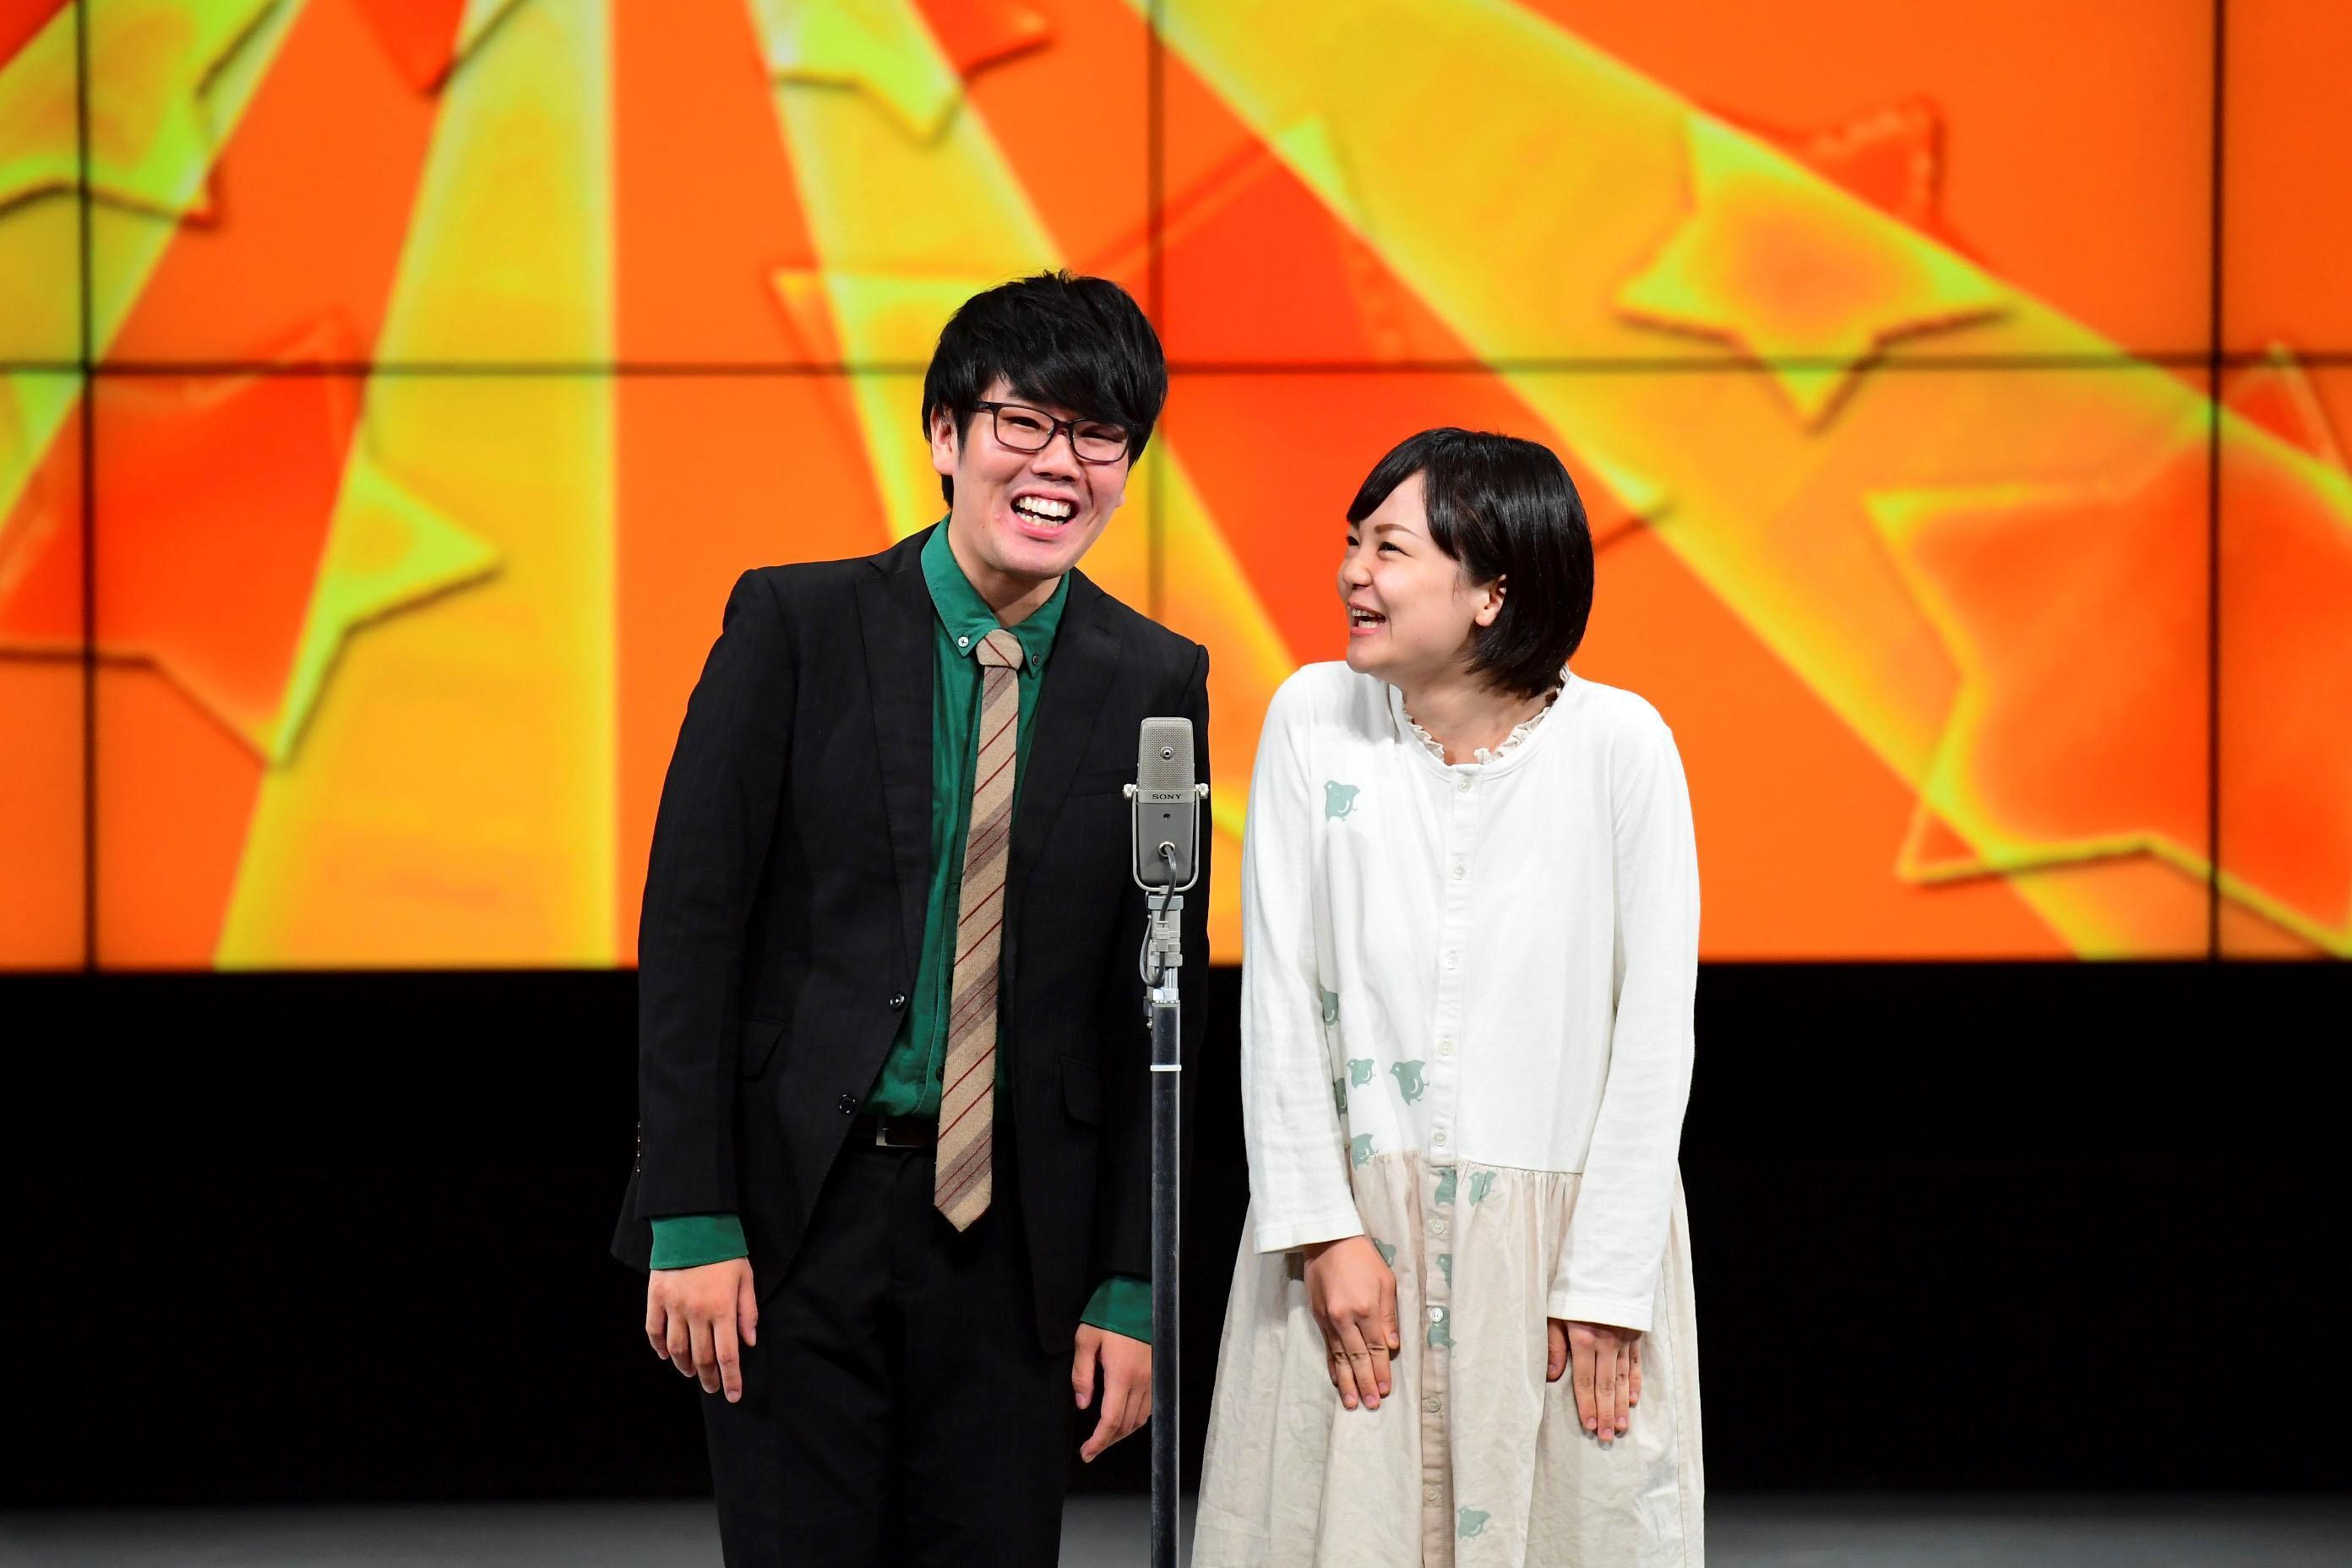 http://news.yoshimoto.co.jp/20170929191740-a90980792344b24f46a83ba4f3ee973a6147987f.jpg